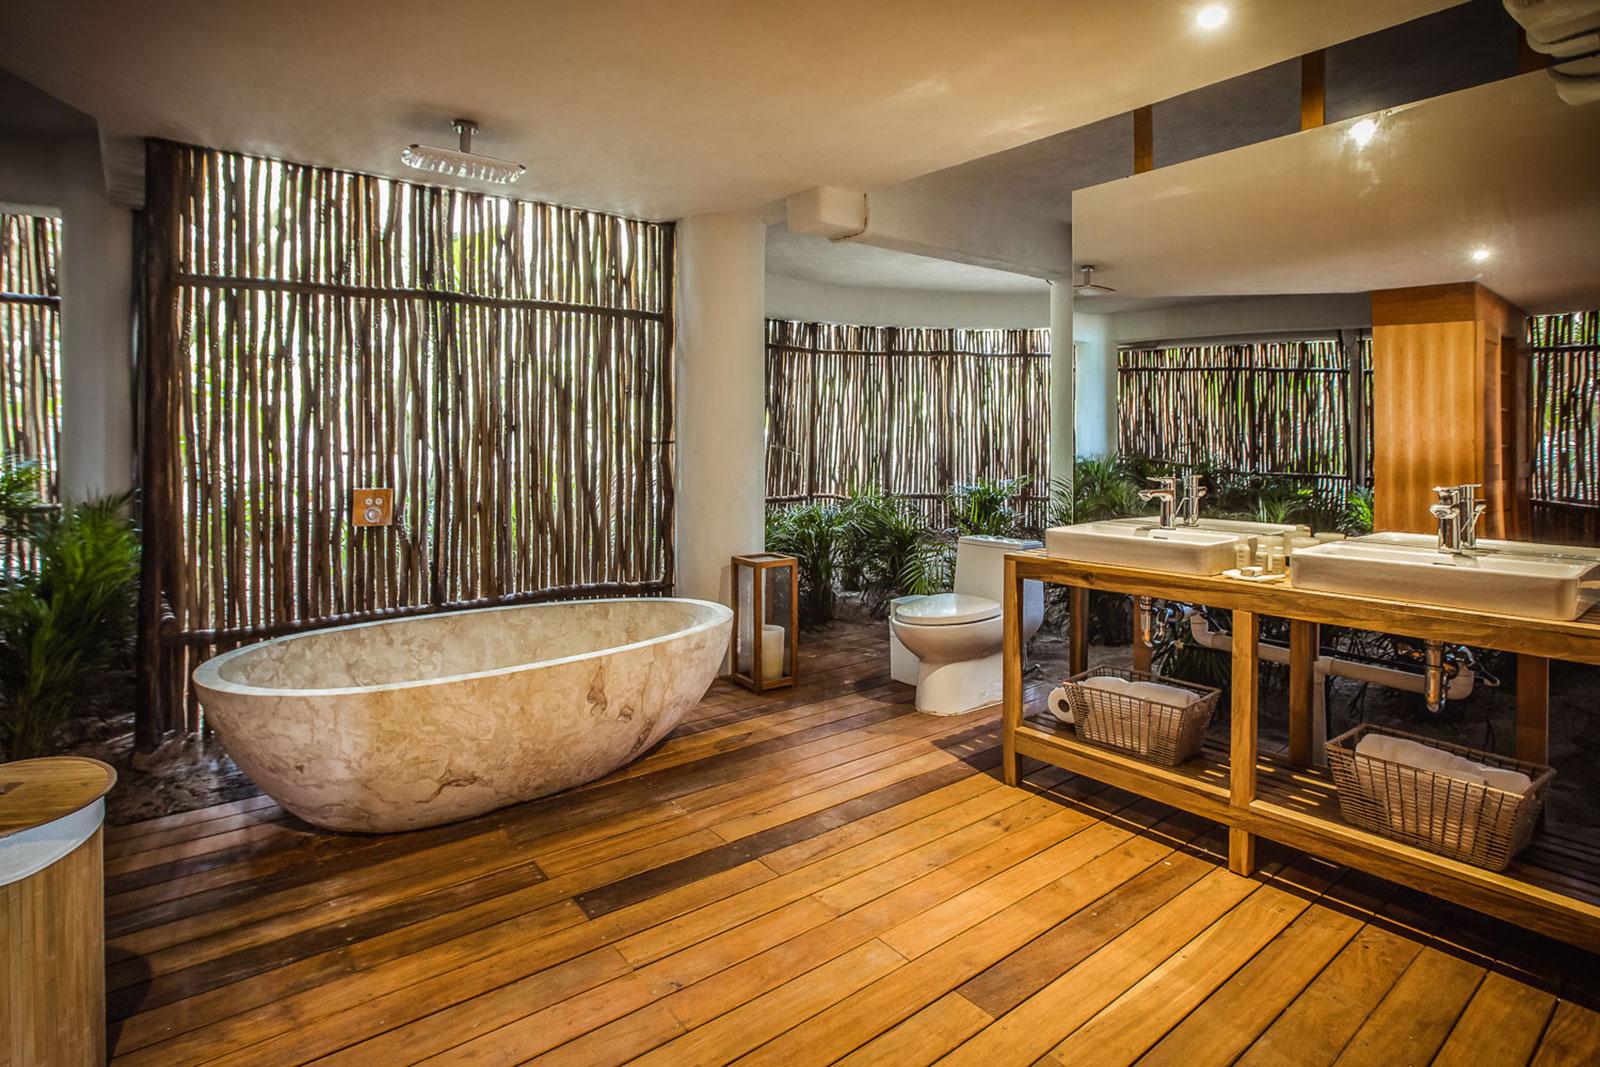 Maya_Luxe_Riviera_Maya_Luxury_Villas_Experiences_Sian_Kaan_5_Bedrooms_Casa_Nalum_18 (1).jpg